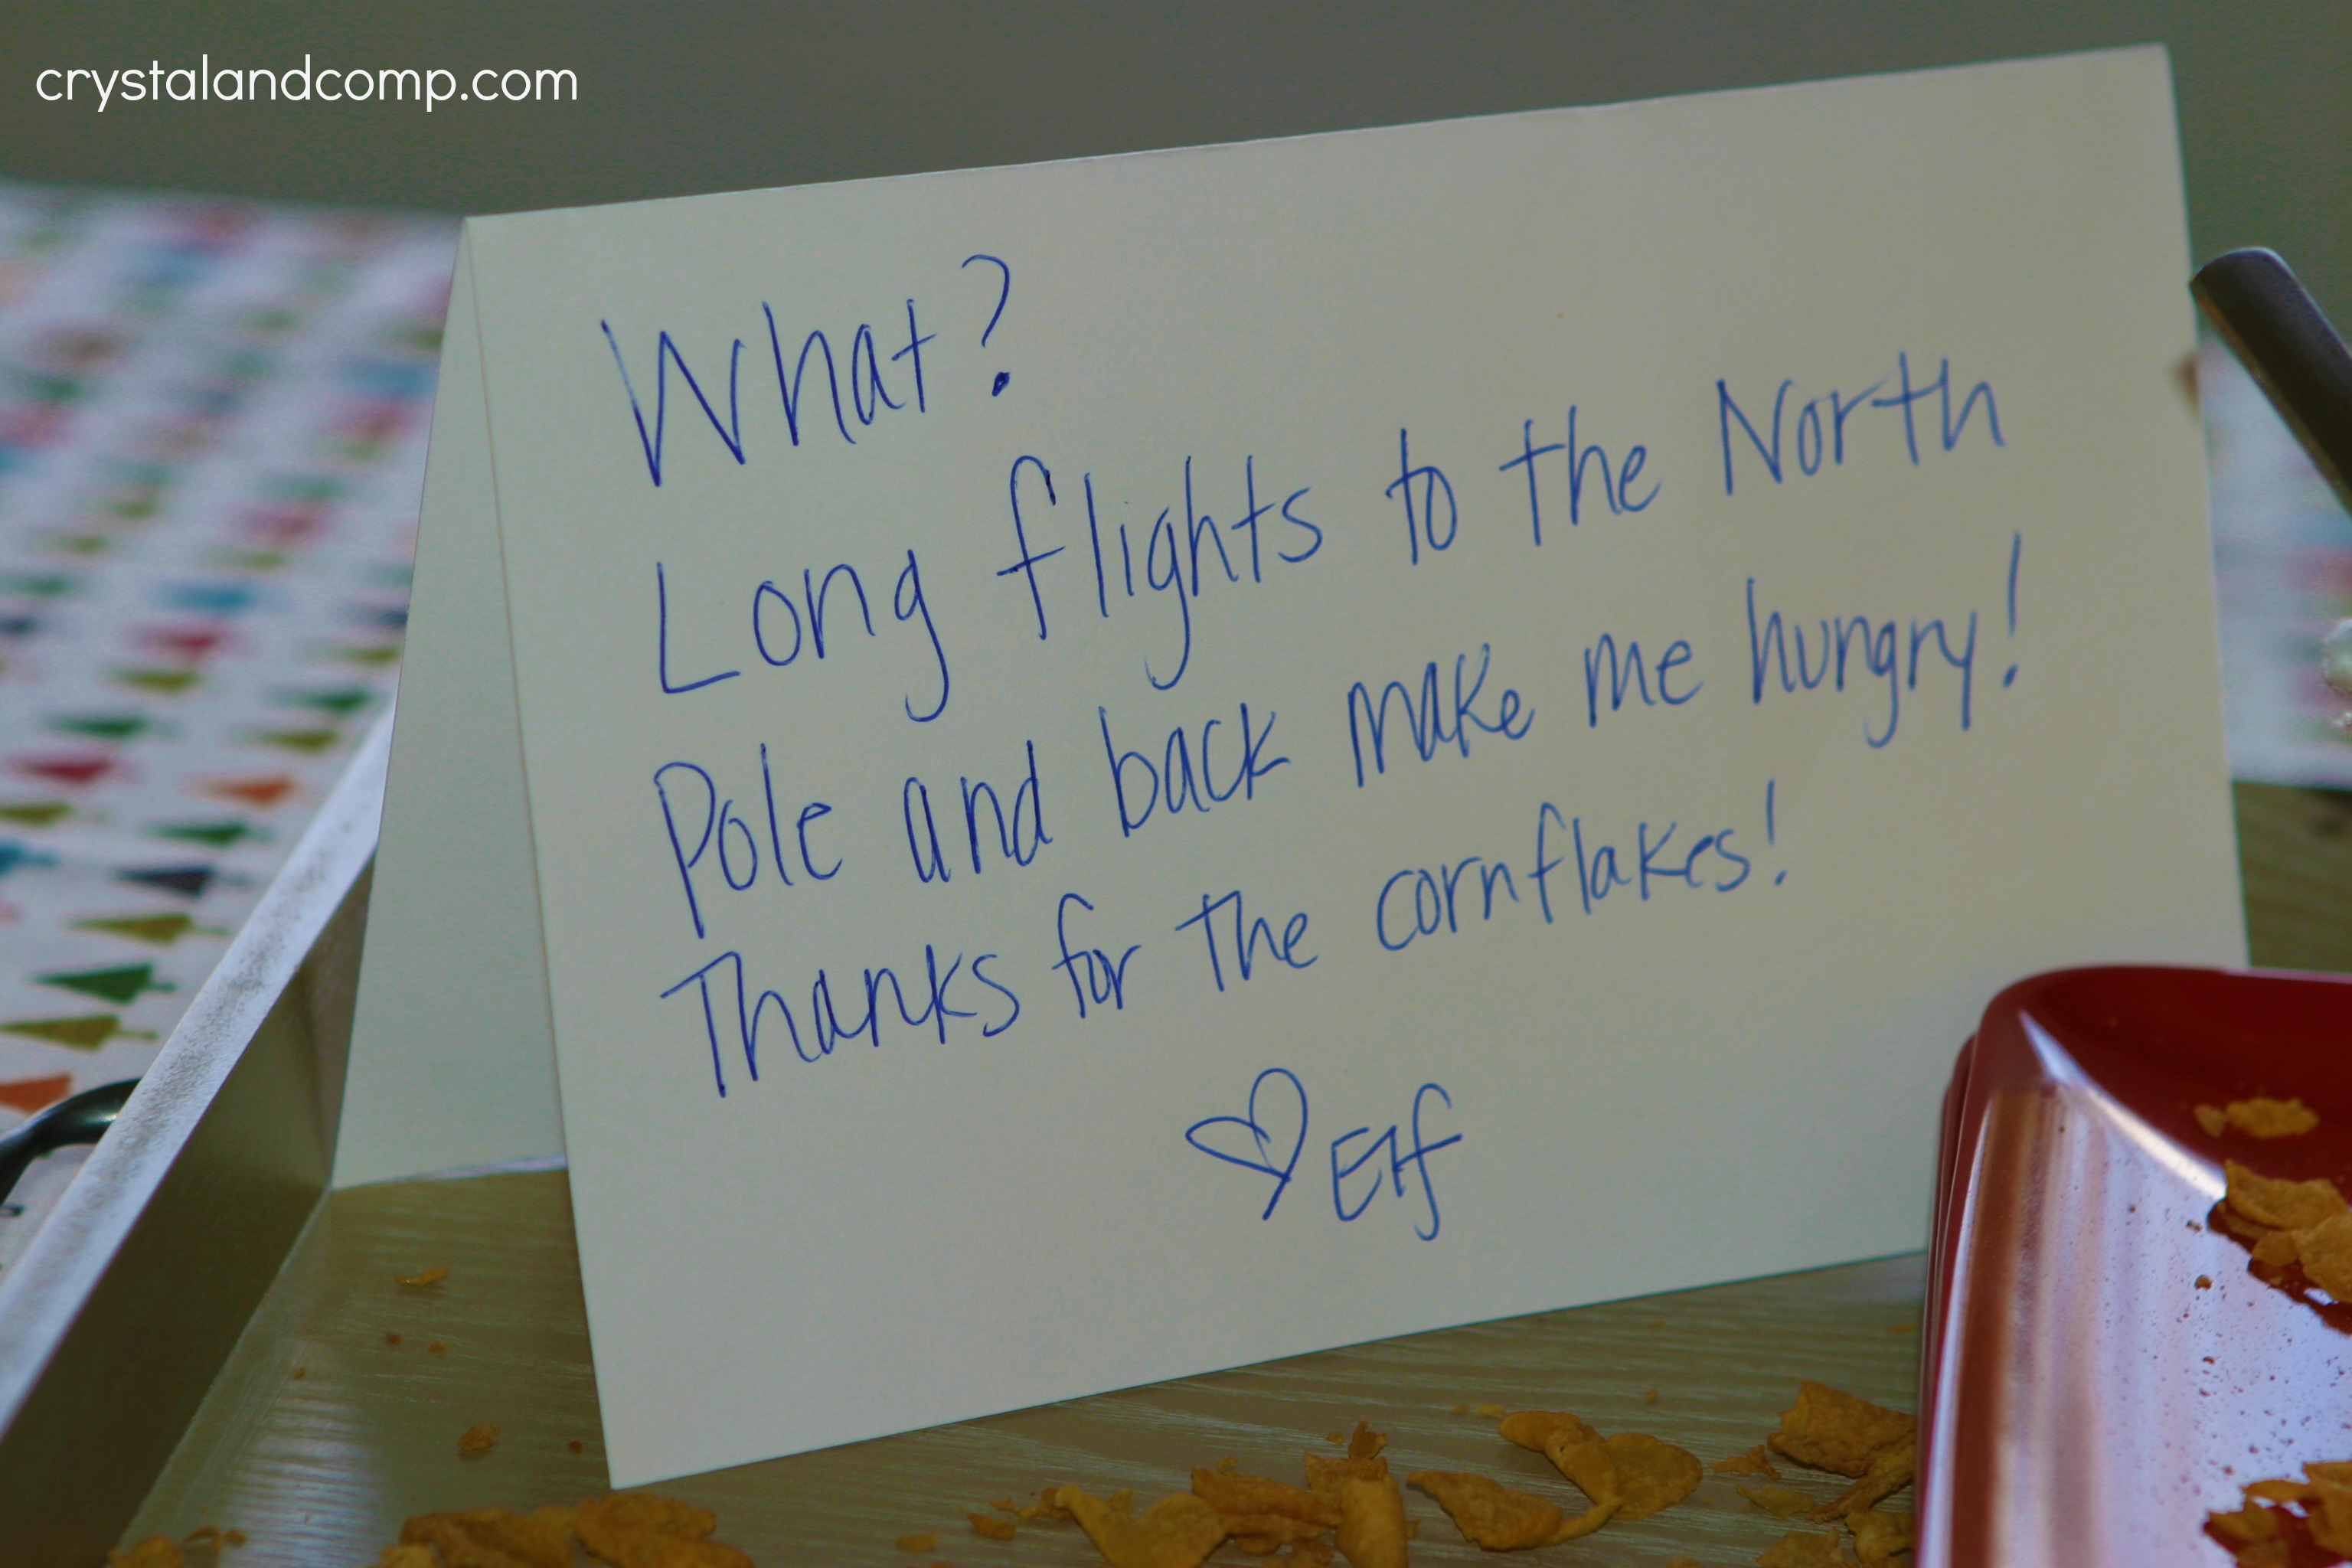 elf on the shelf  long flights to the north pole make elf